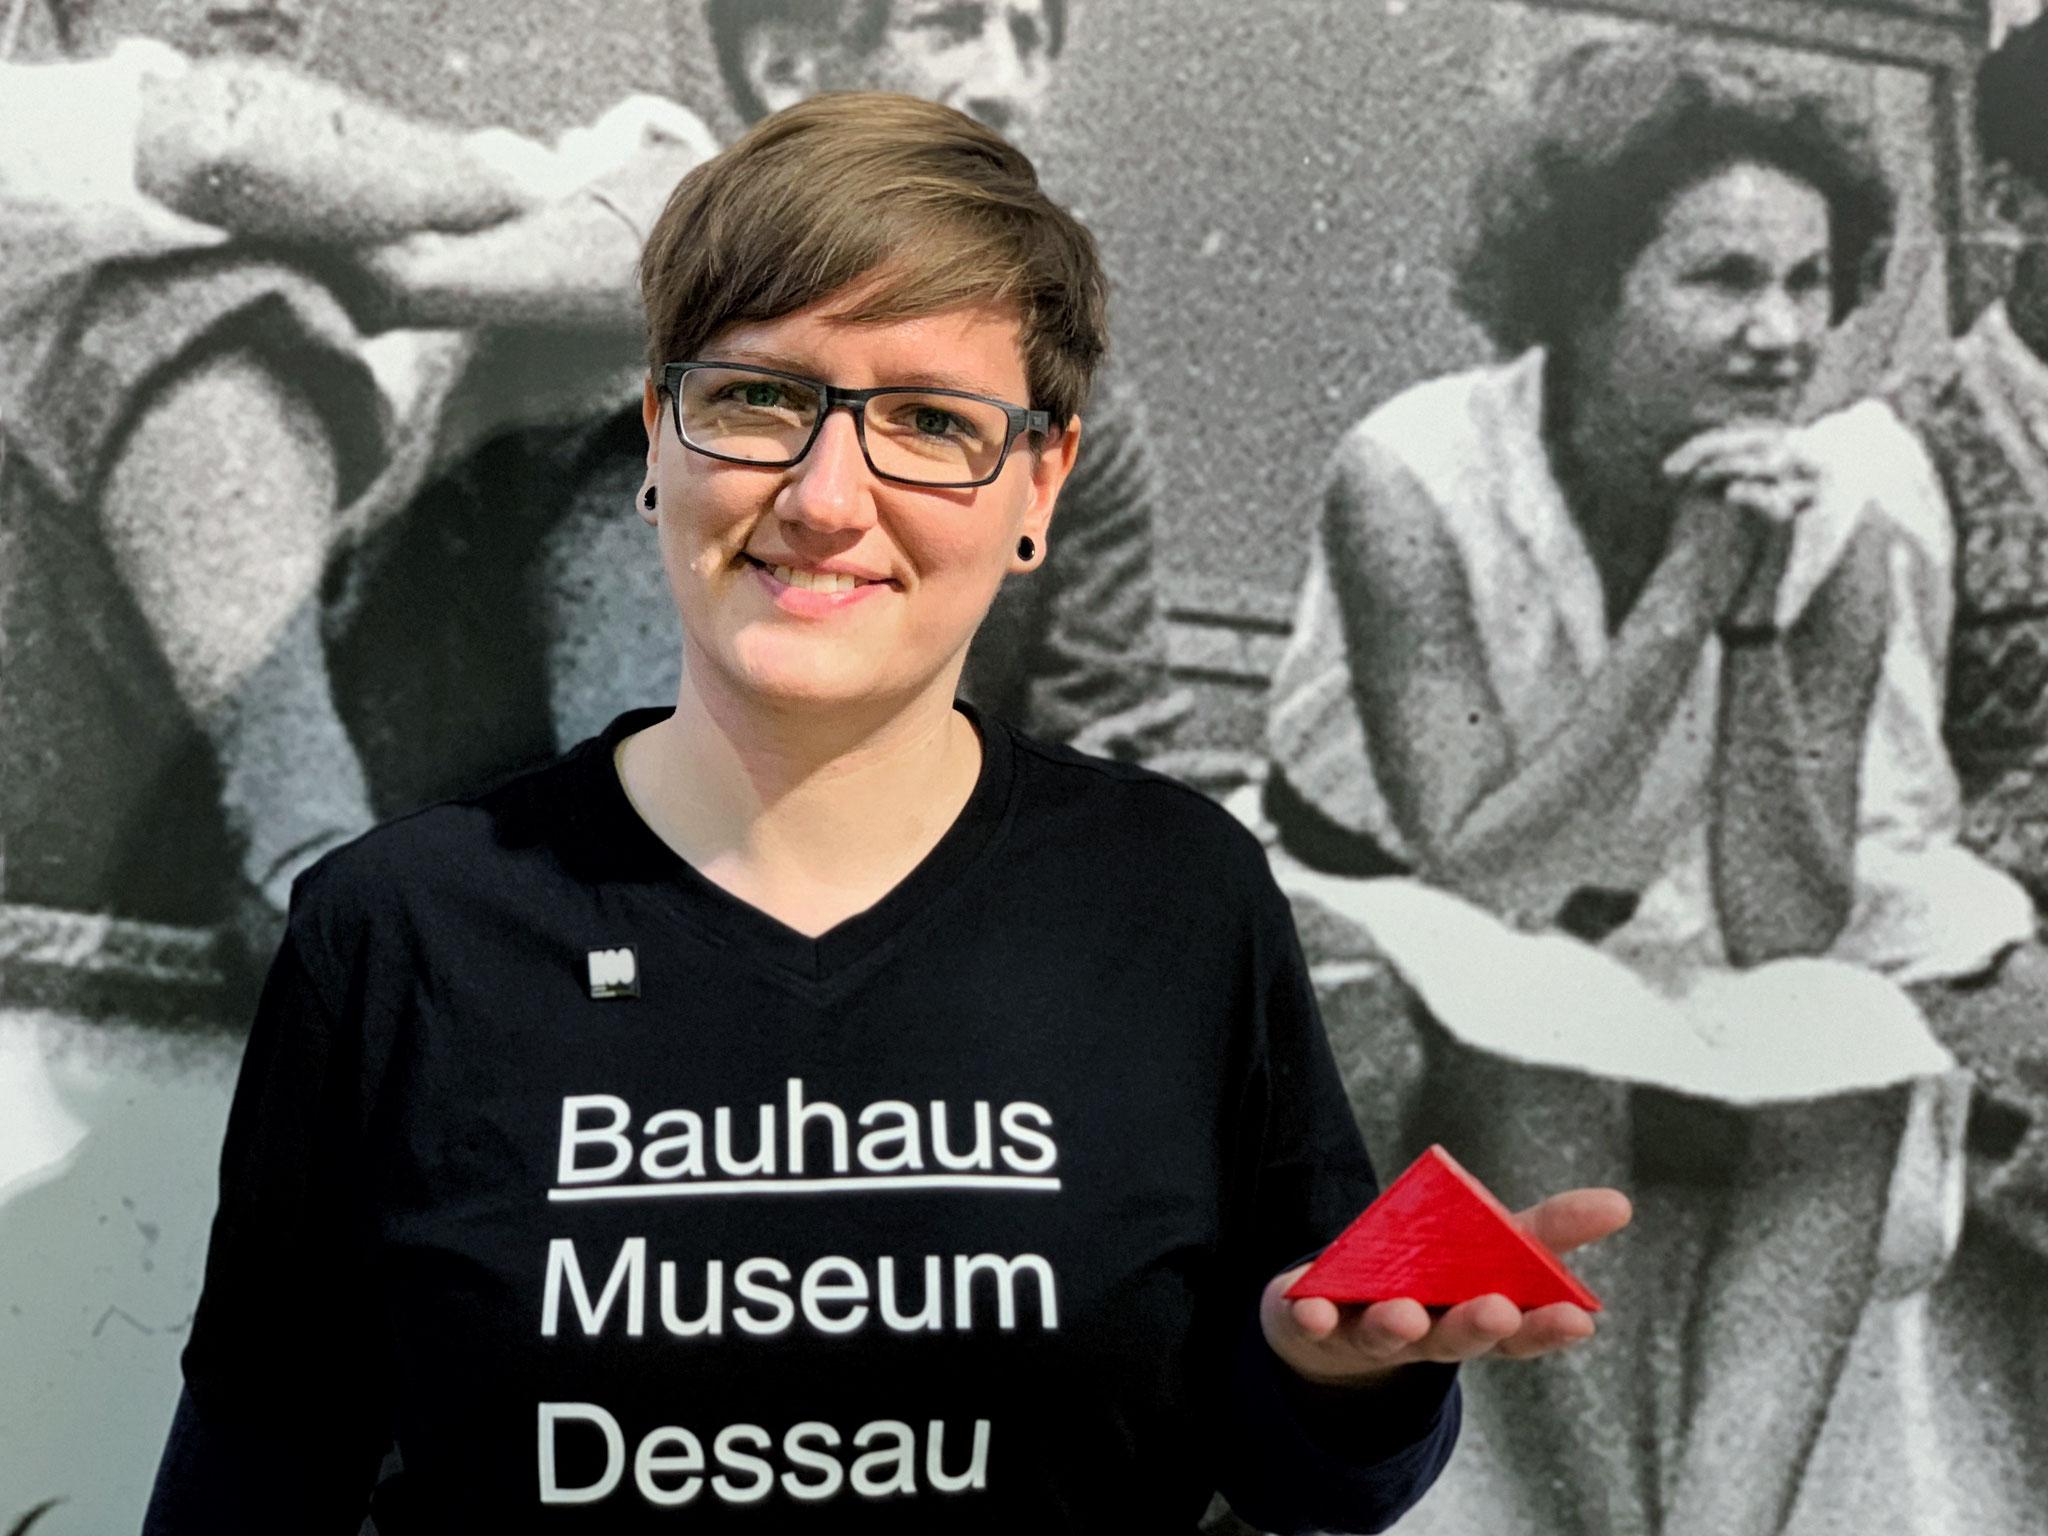 Ute König, Bauhaus Dessau